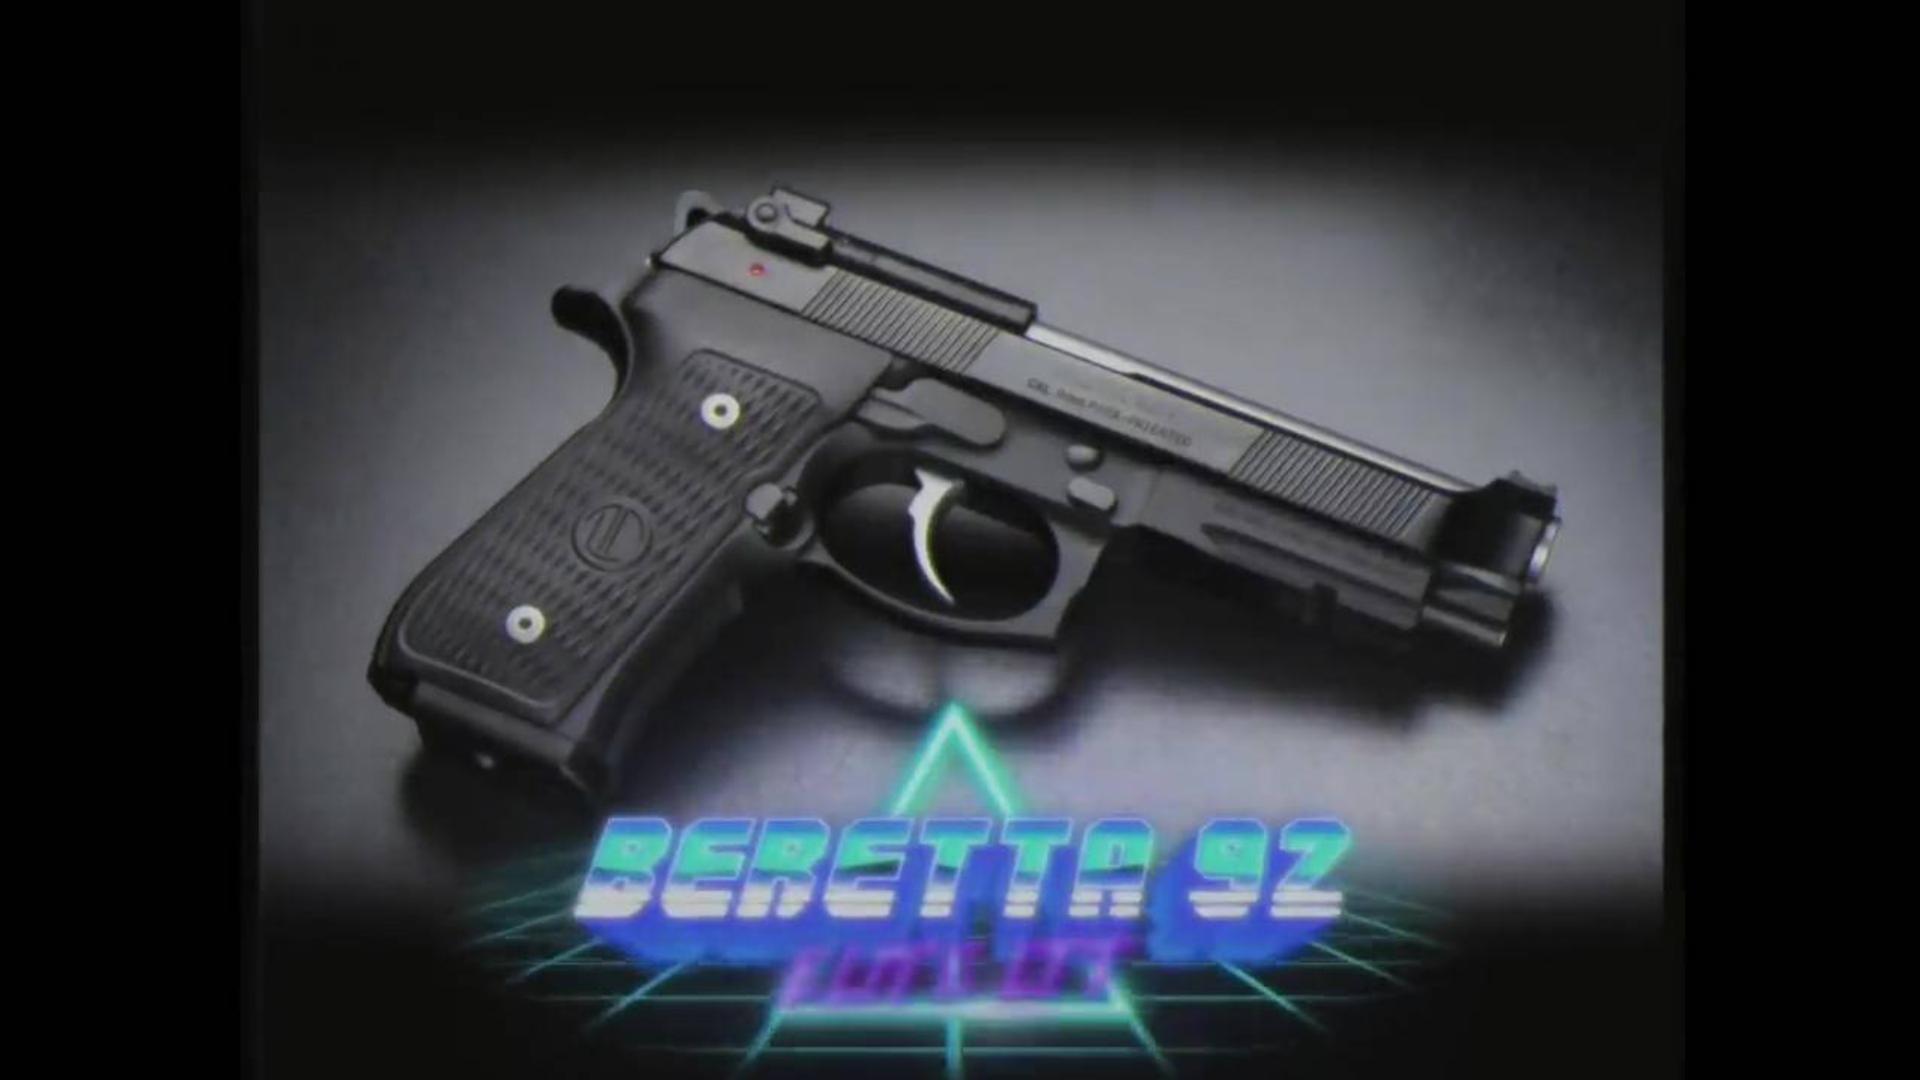 Beretta 92 Elite LTT上手评测